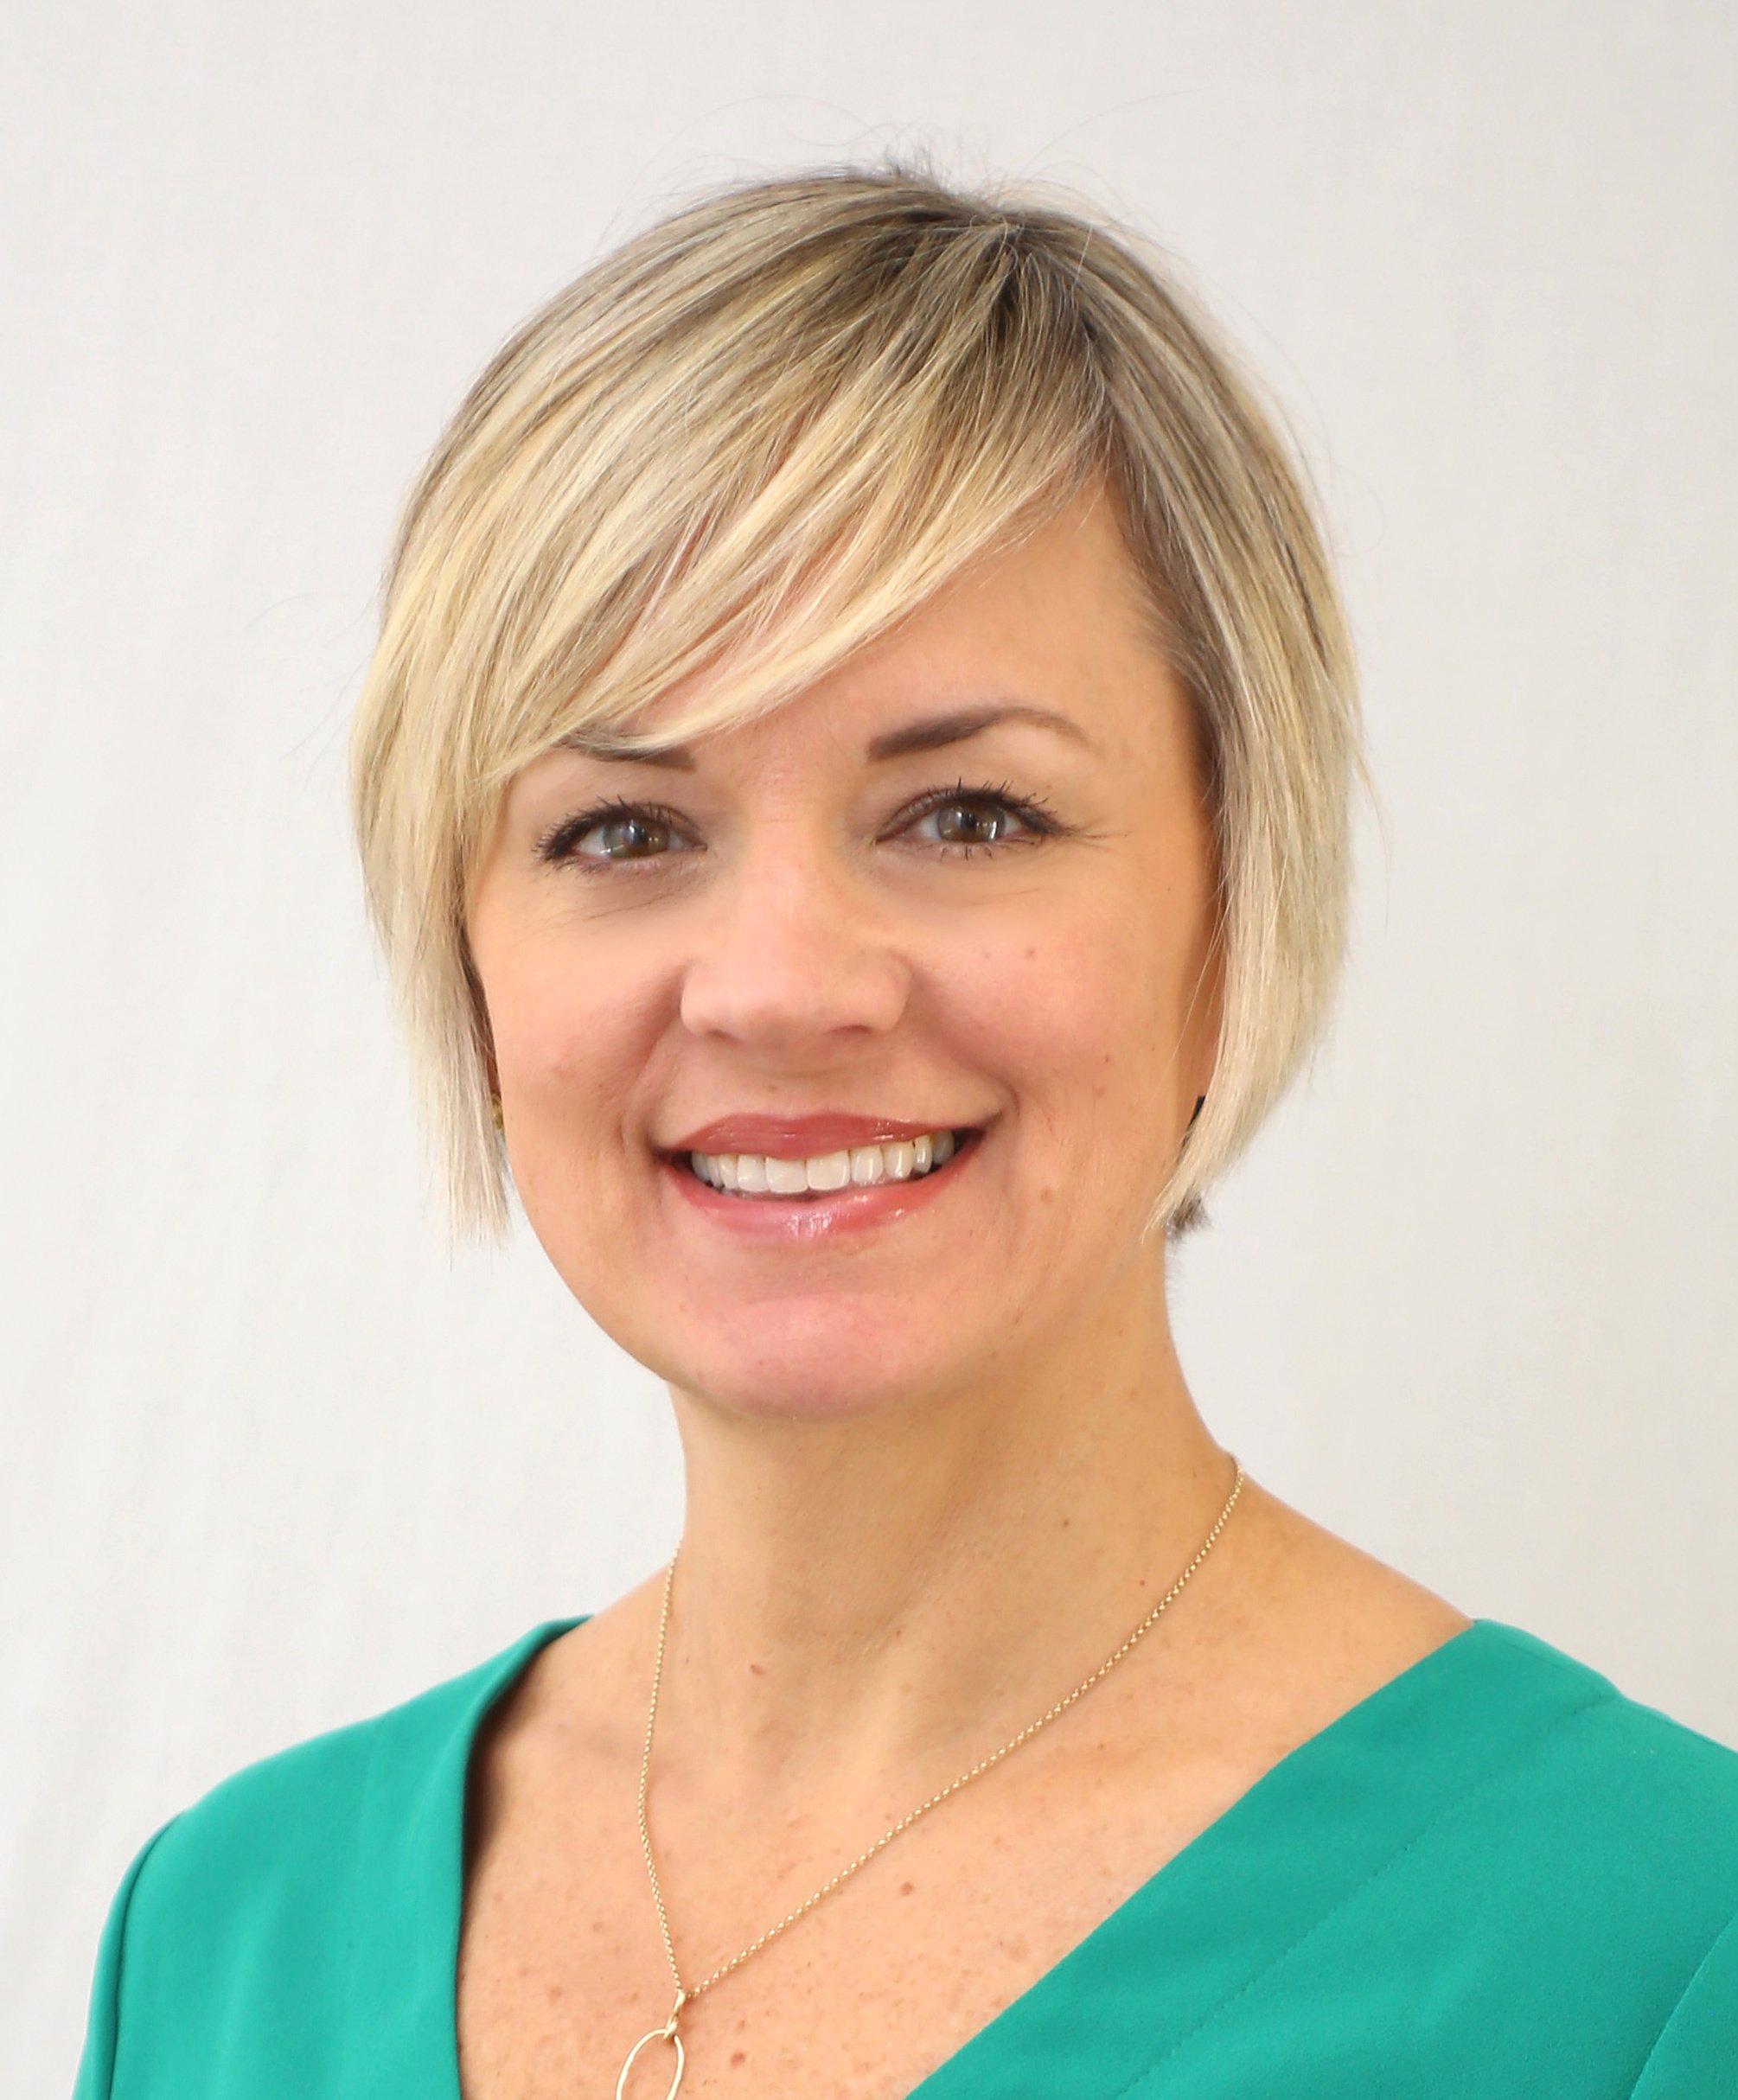 Ms. Nicole Nardi Image